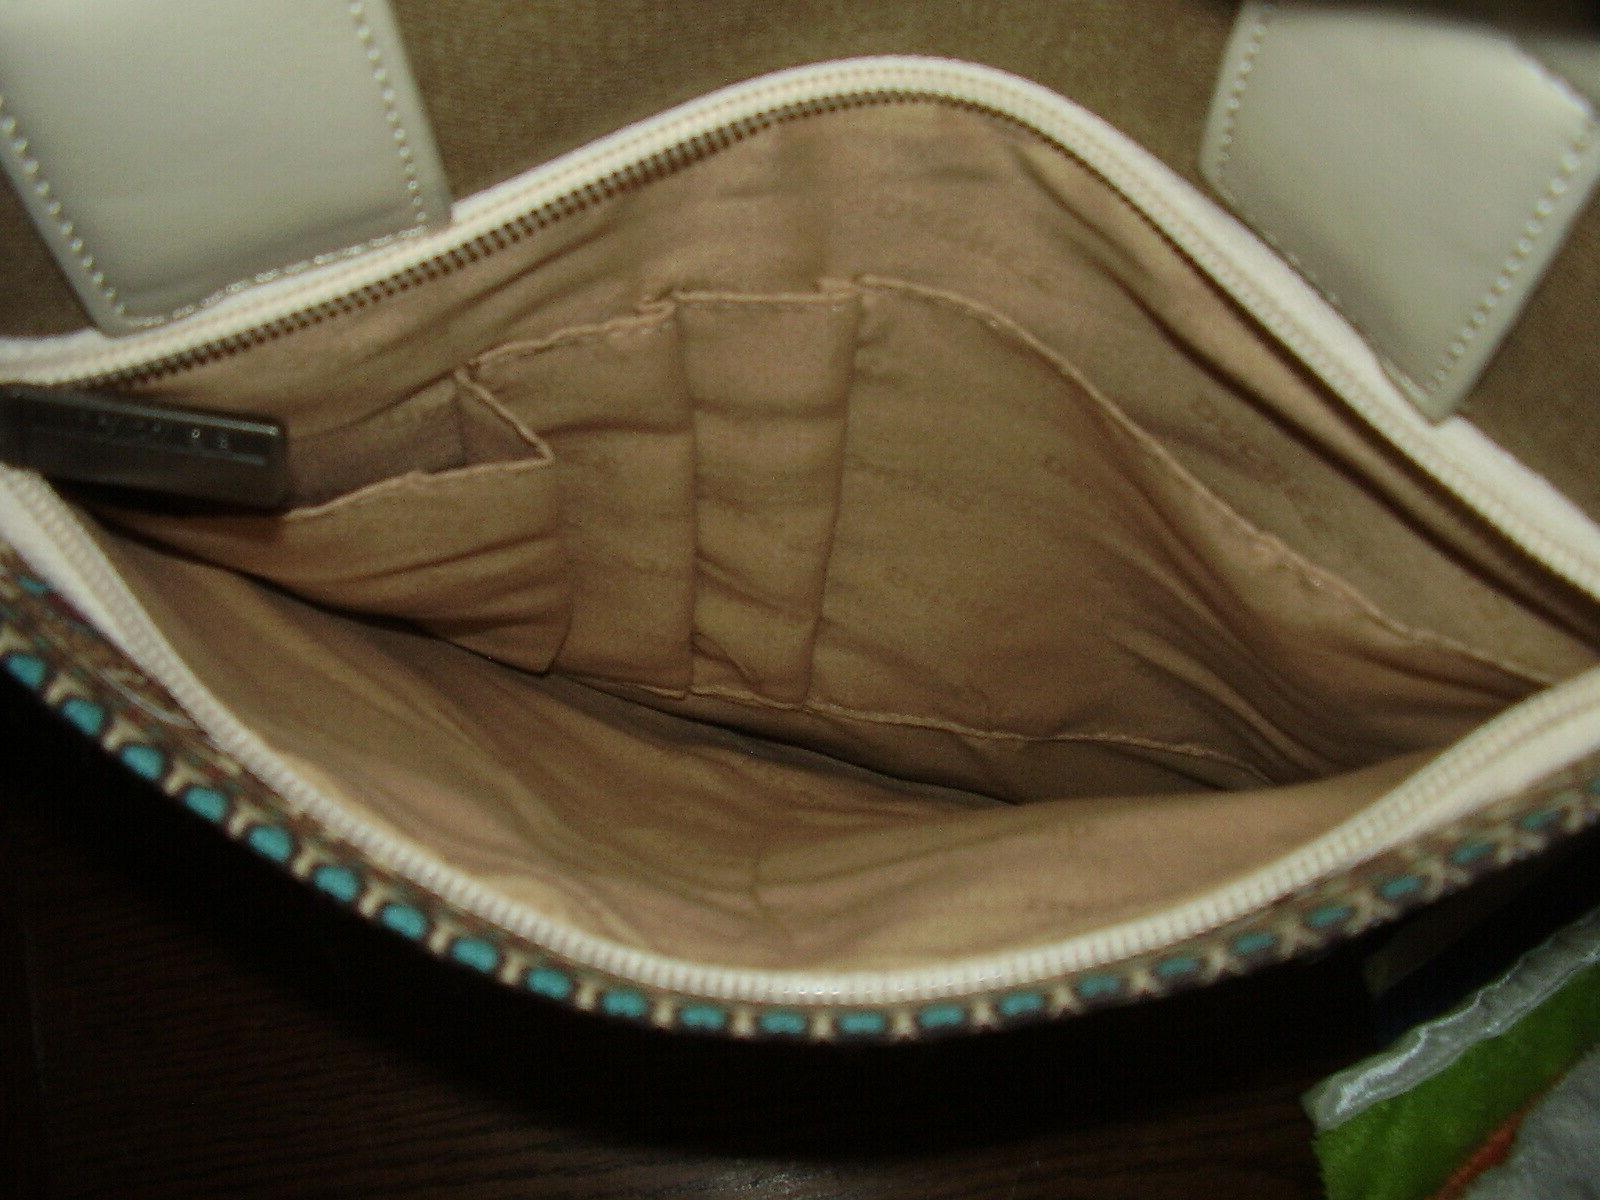 DACHEE Waterproof Laptop Messenger Case Compartmens, NEW